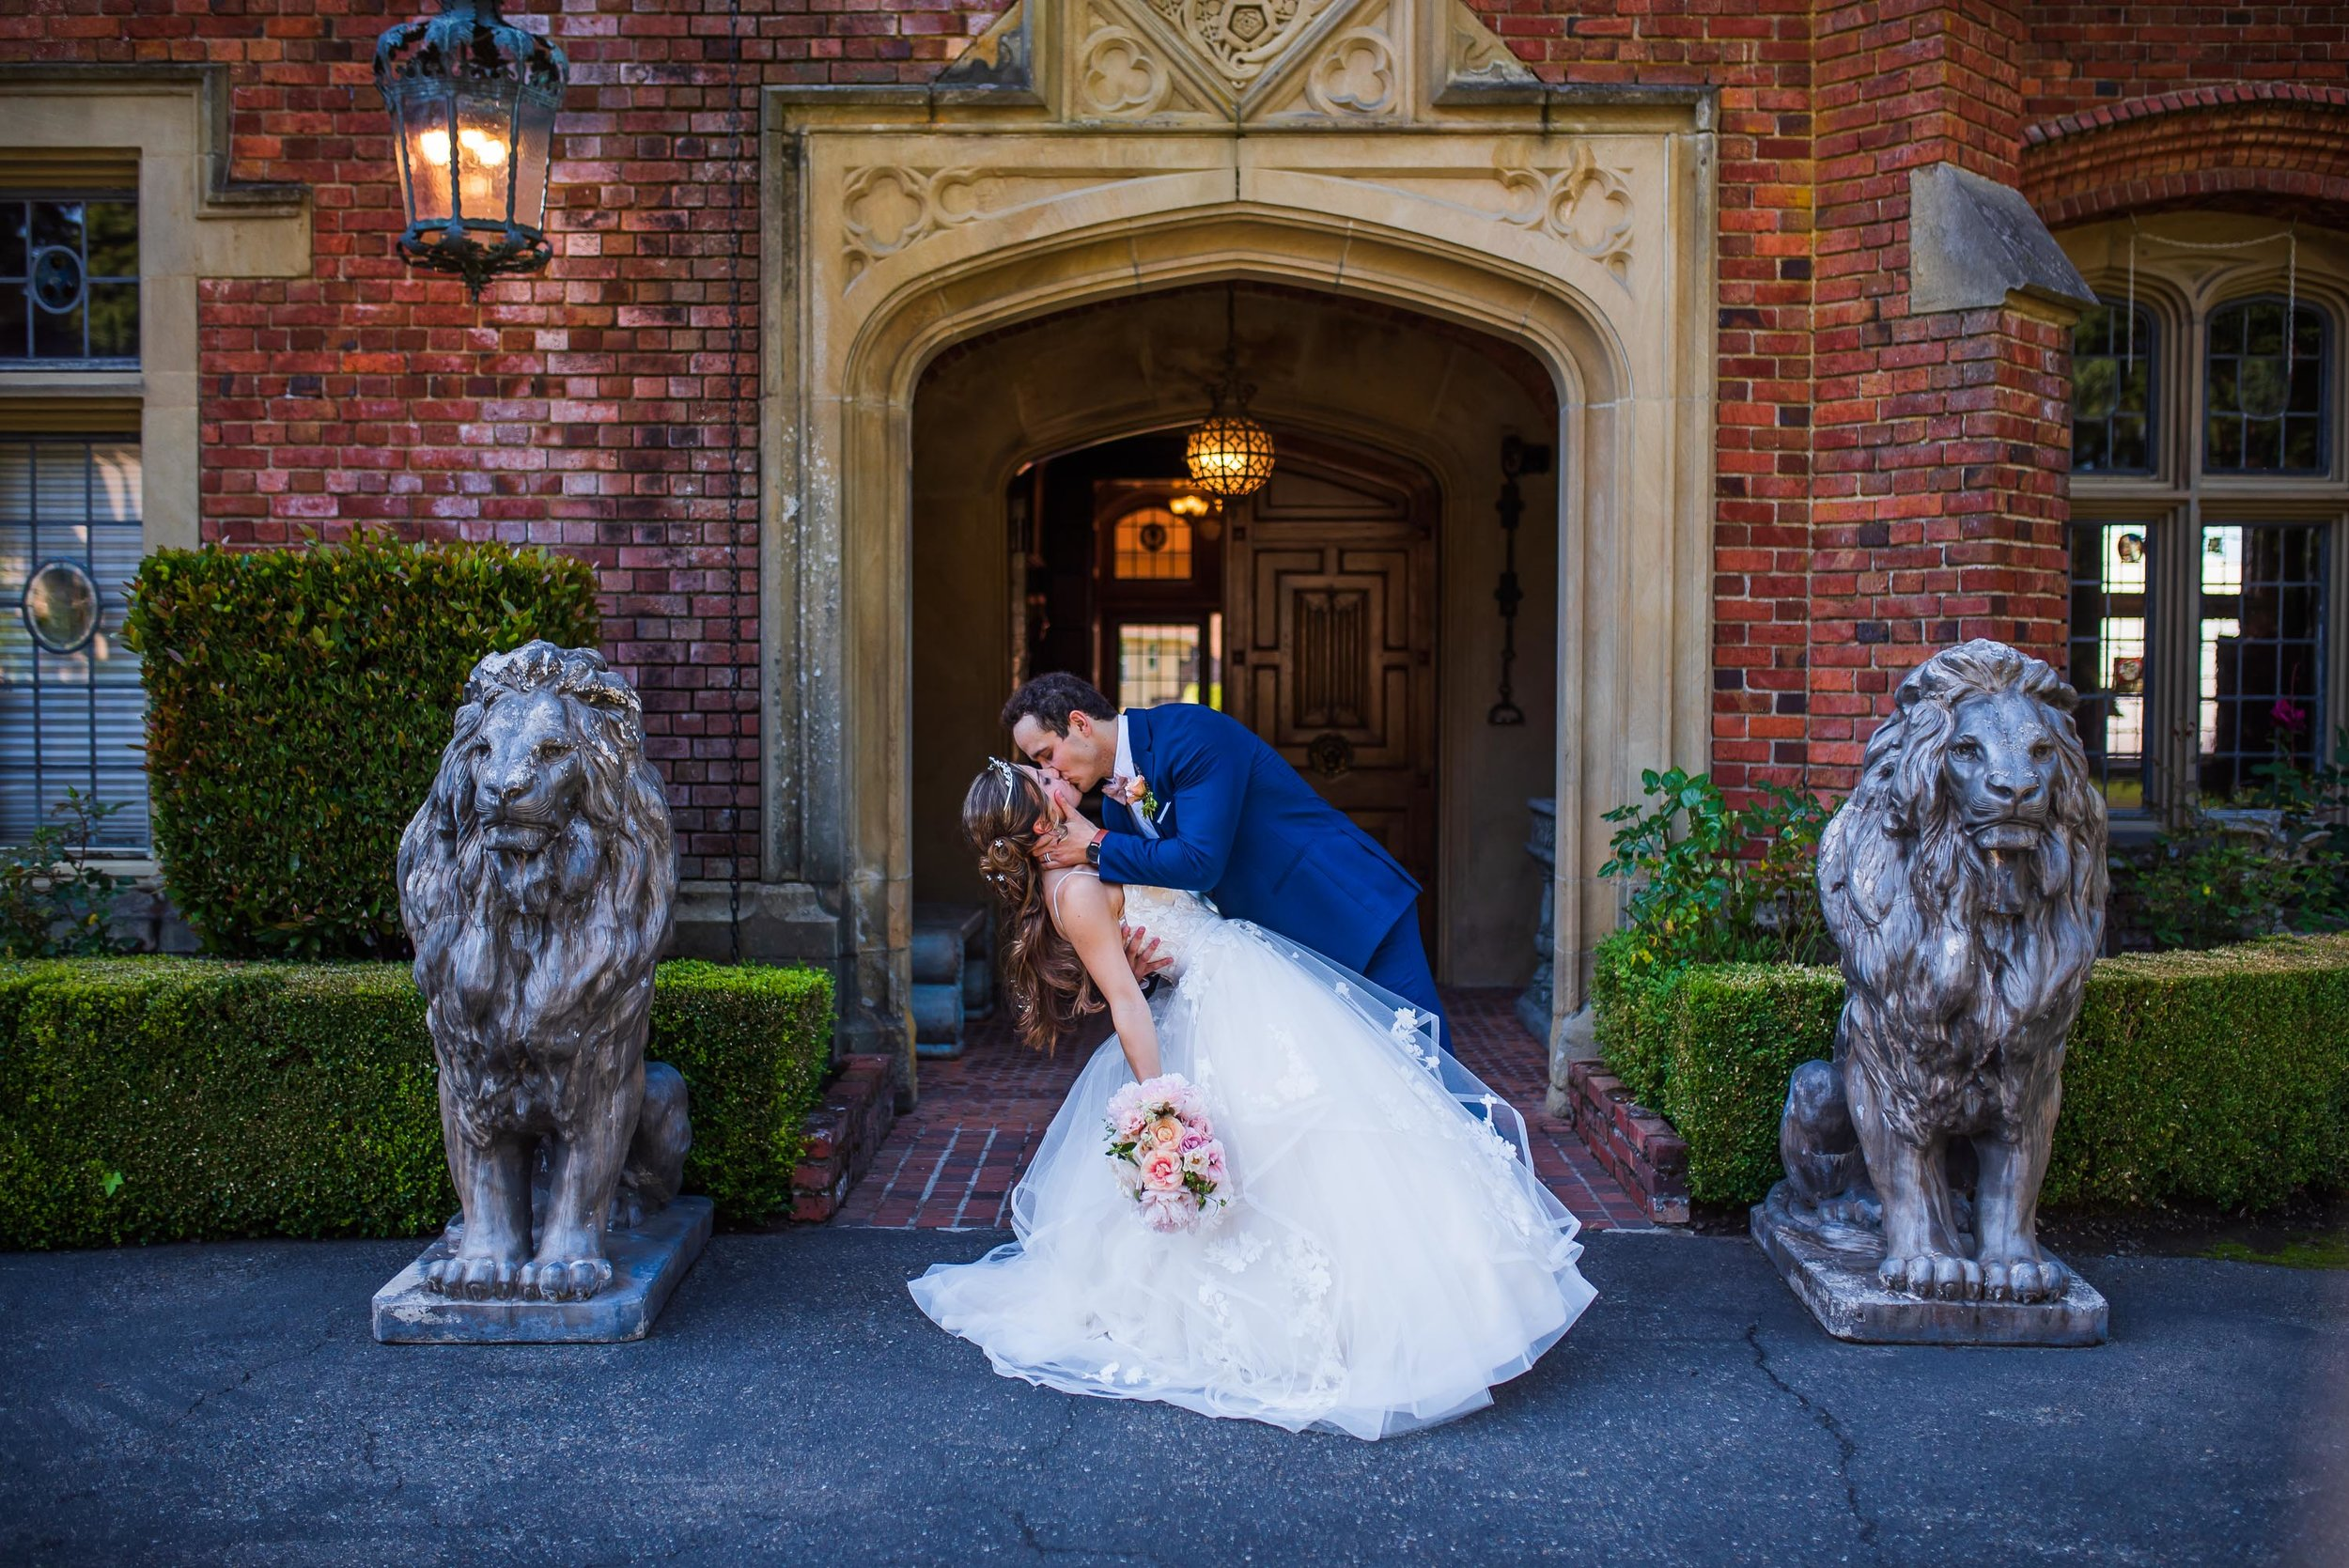 thornewood castle wedding 58.jpg